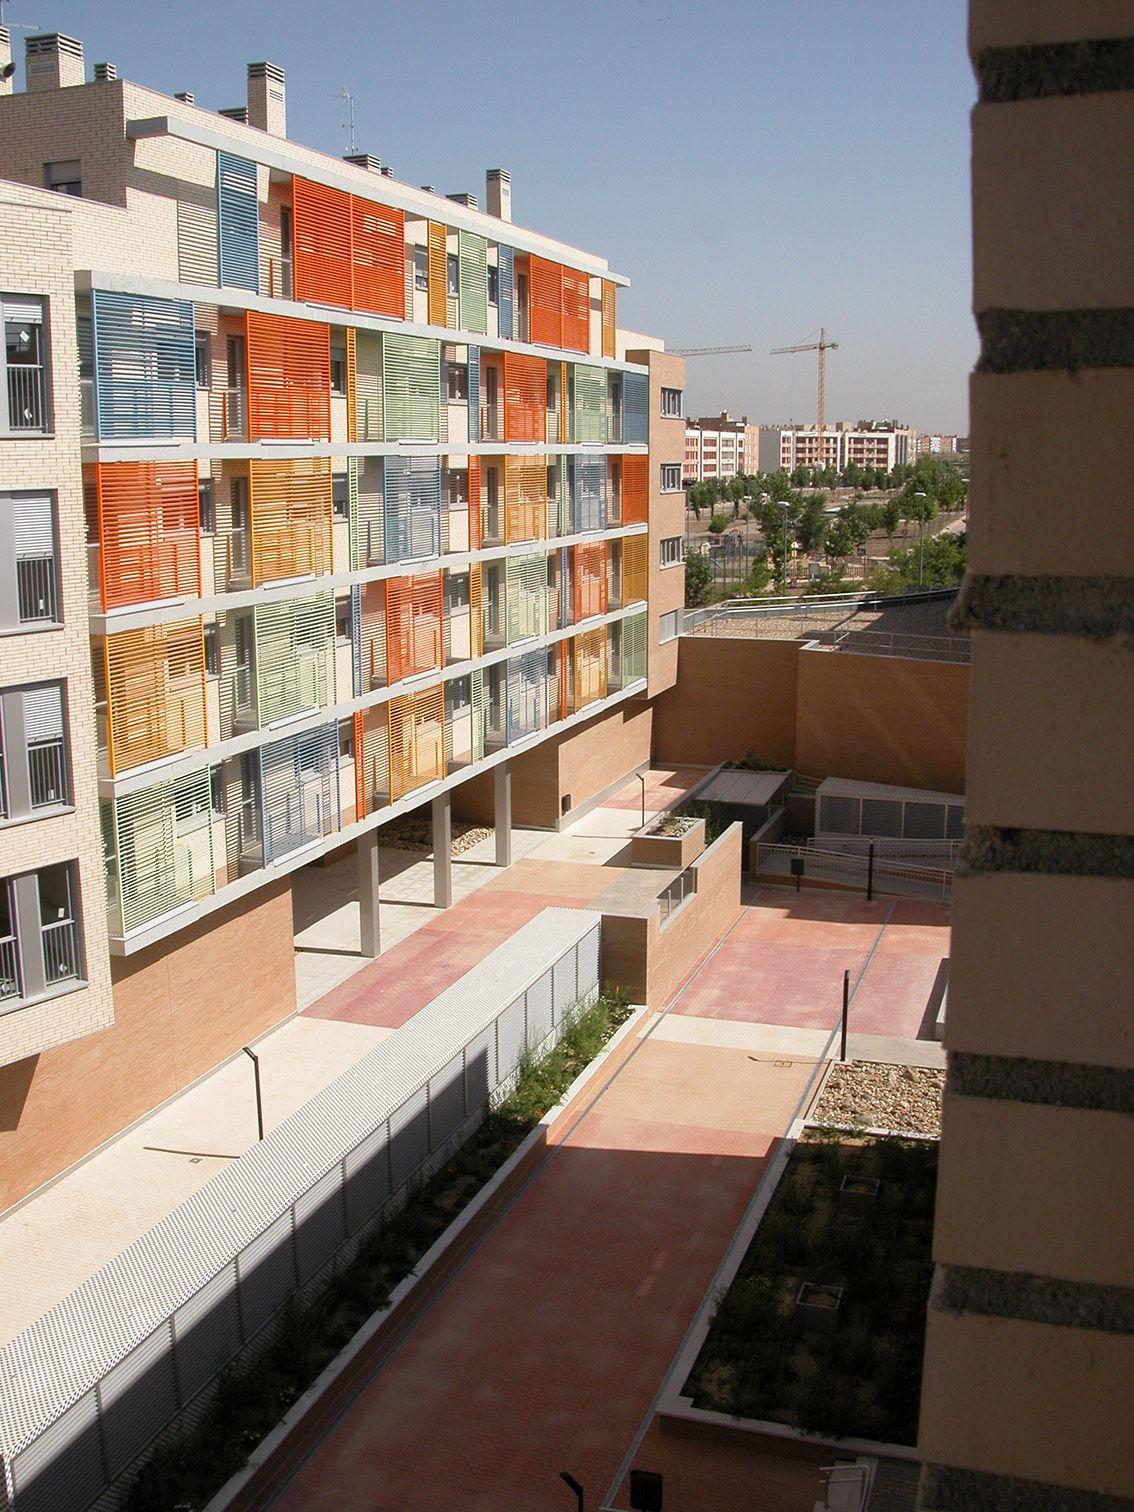 114 viviendas vpo ruiz albusac arquitectos torrej n de ardoz madrid residencial pinterest - Arquitectos interioristas madrid ...